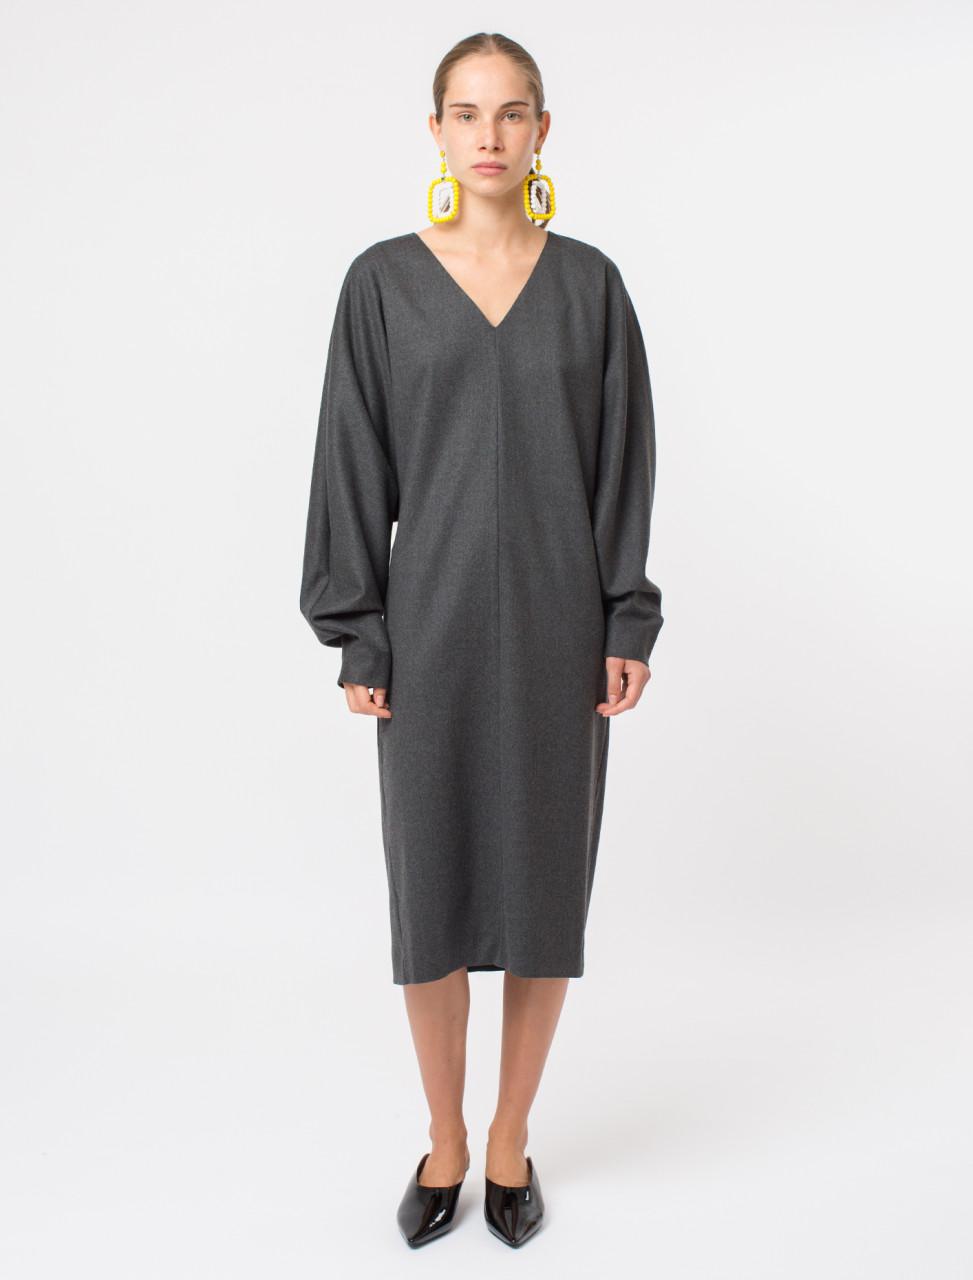 Coria Dress